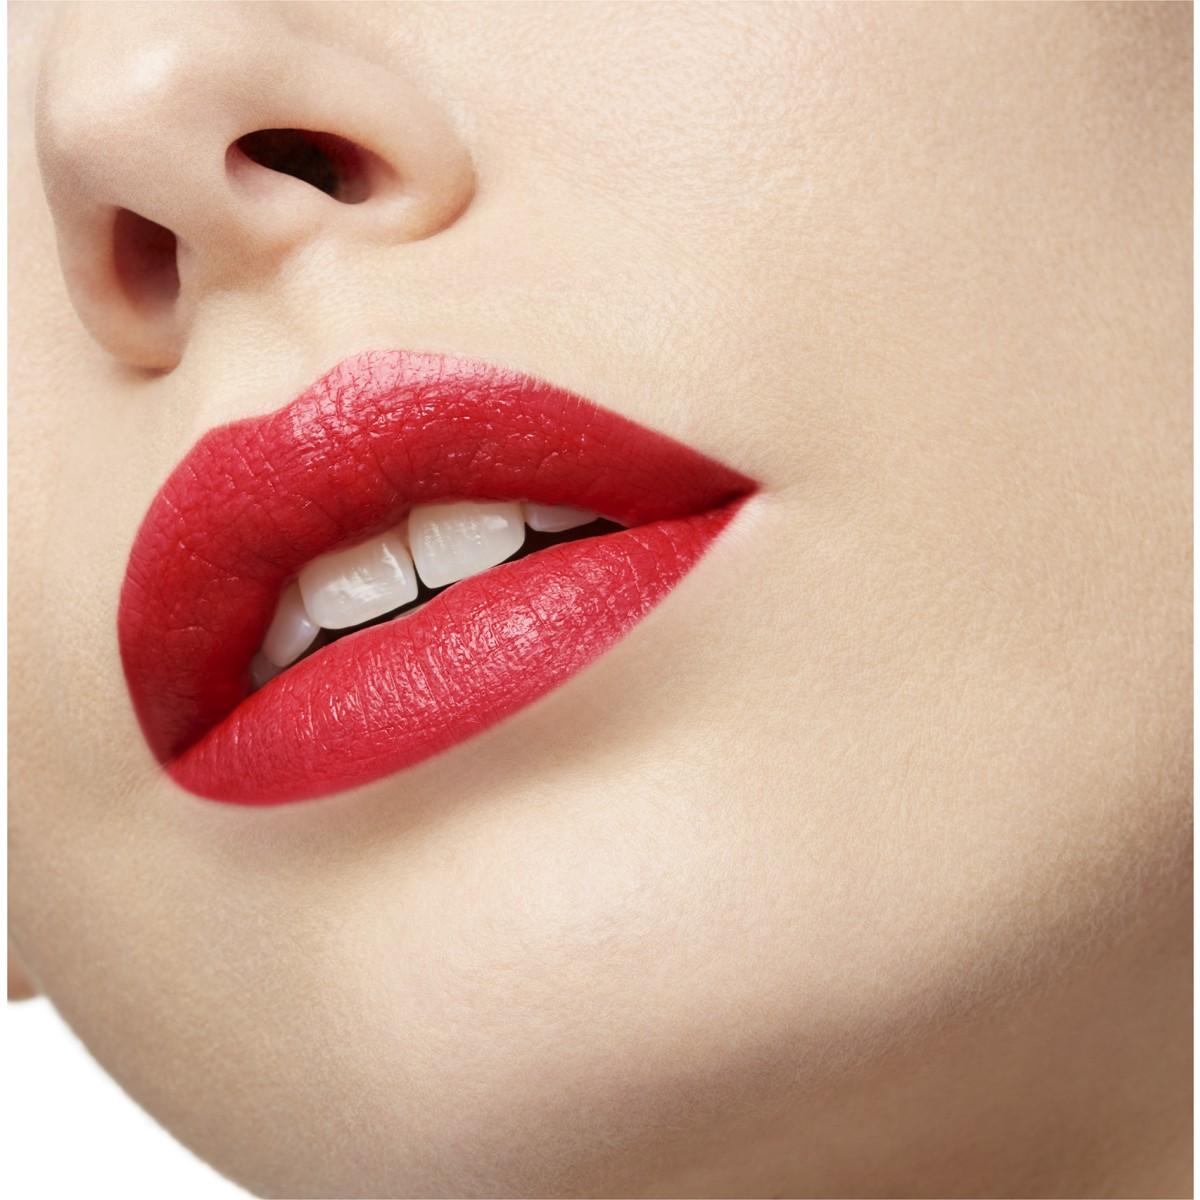 Woman Beauty - リップカラー メキシキャッチー 503s - Christian Louboutin